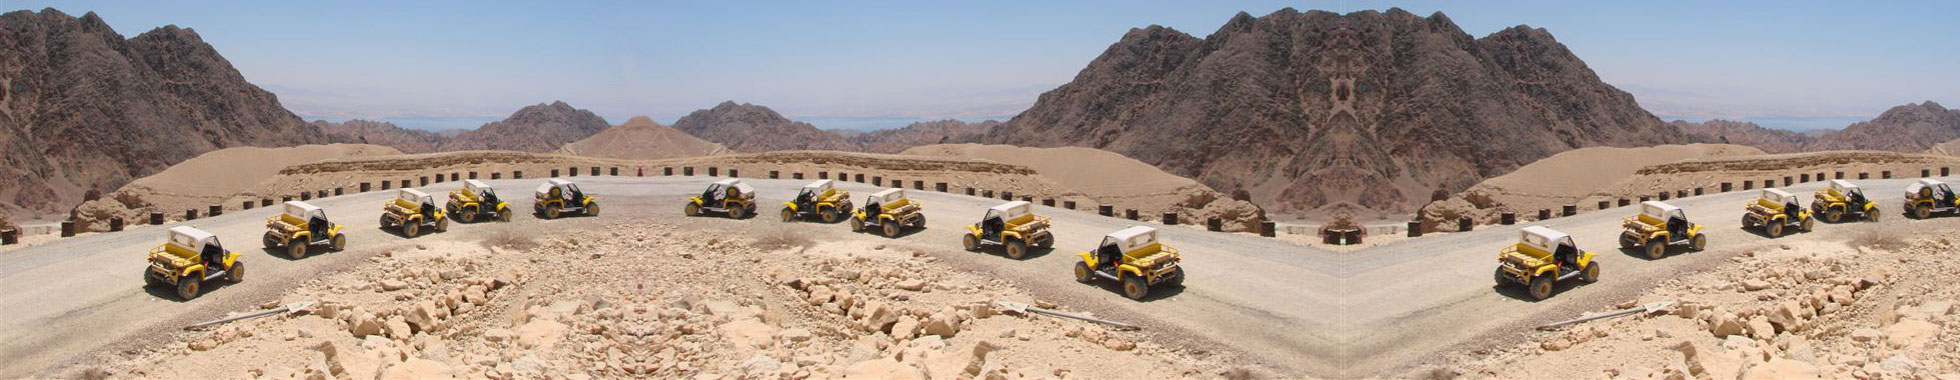 Israel ATVs